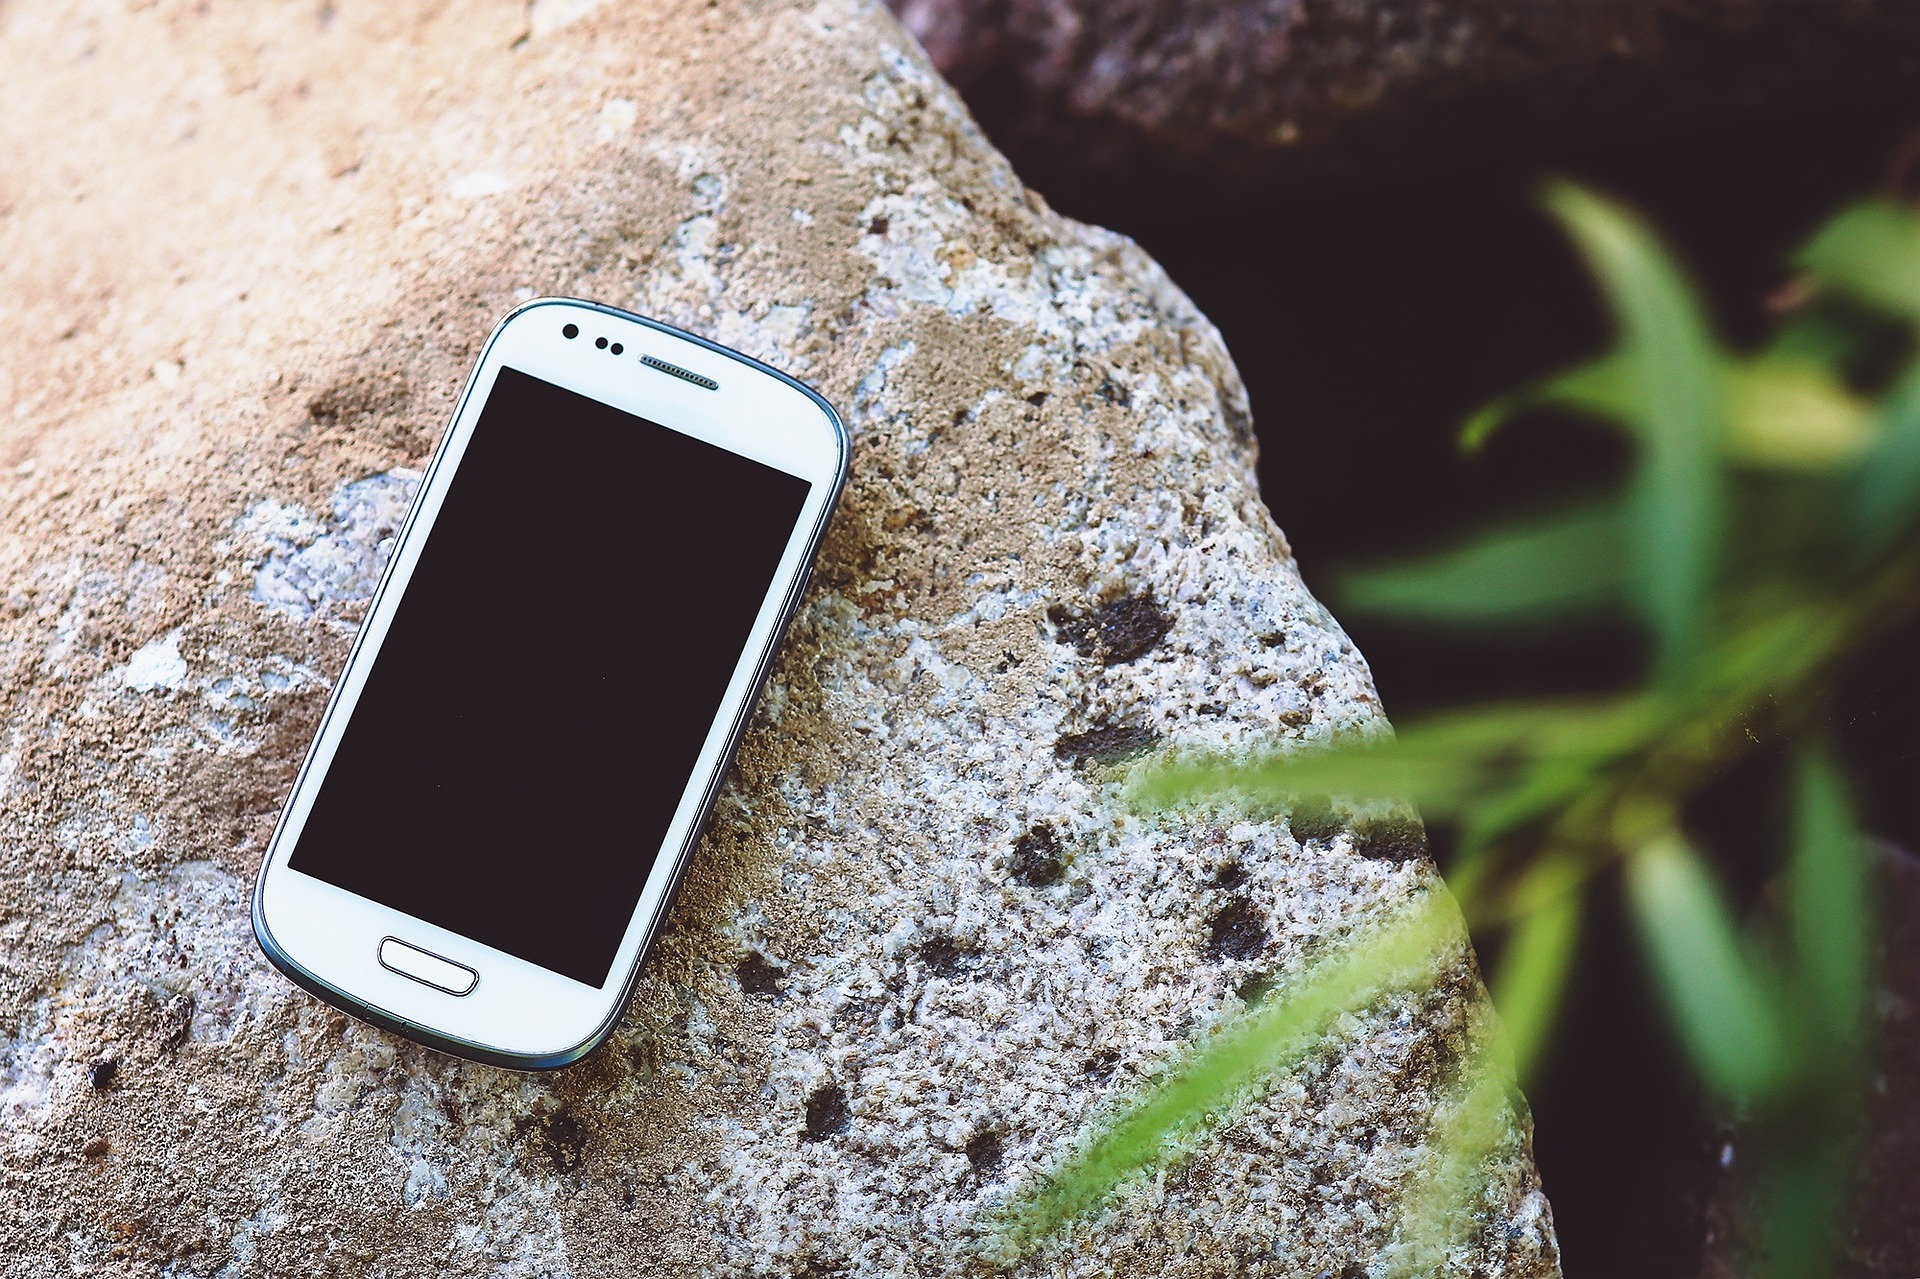 smartphone-791179_1920.jpg